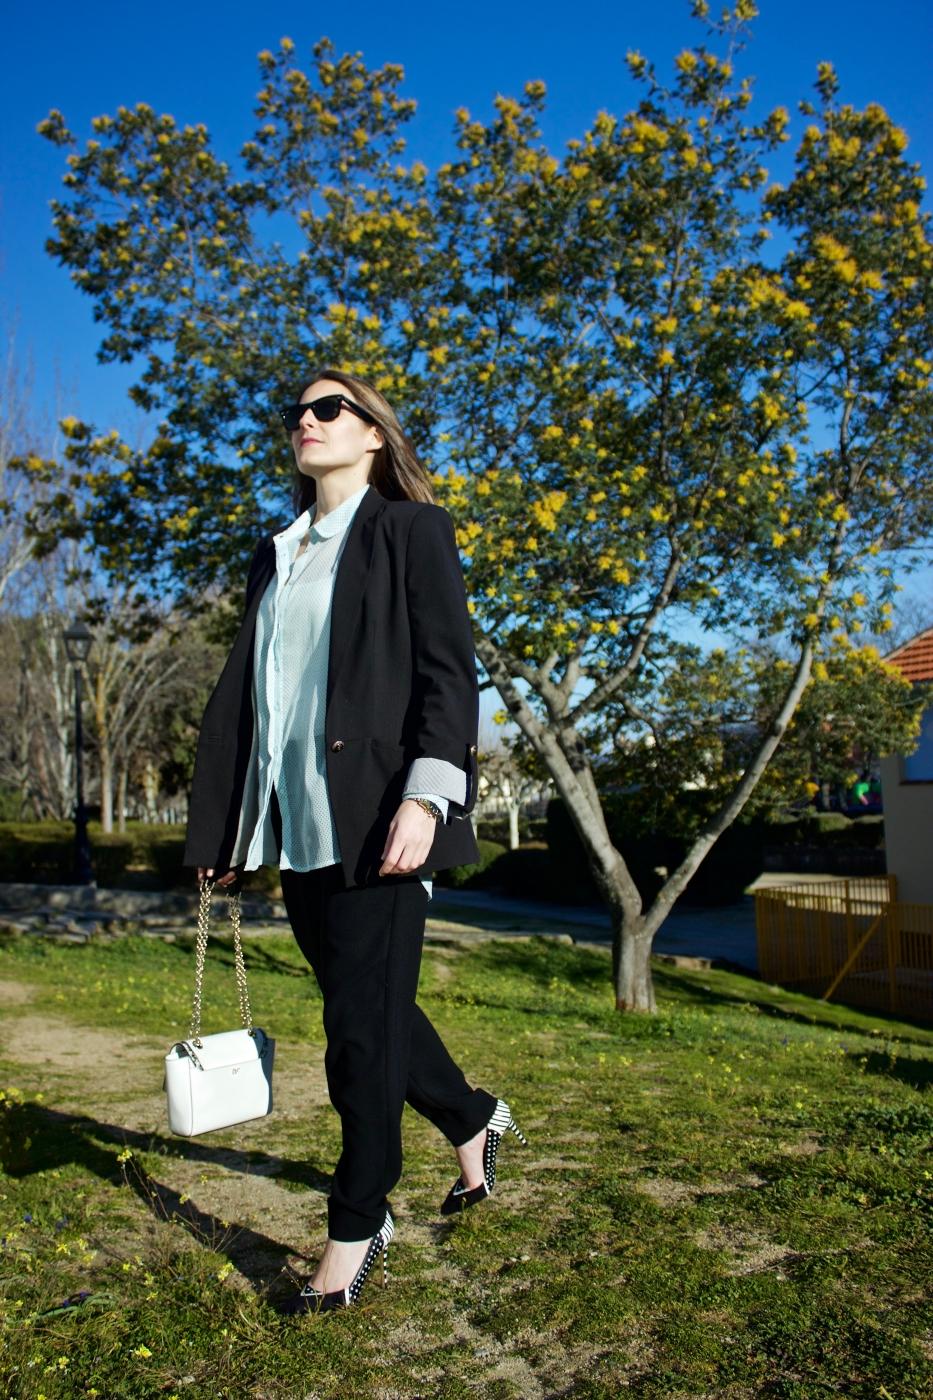 lara-vazquez-madlula-fashion-blog-moda-urbano-look-oficina-ootd